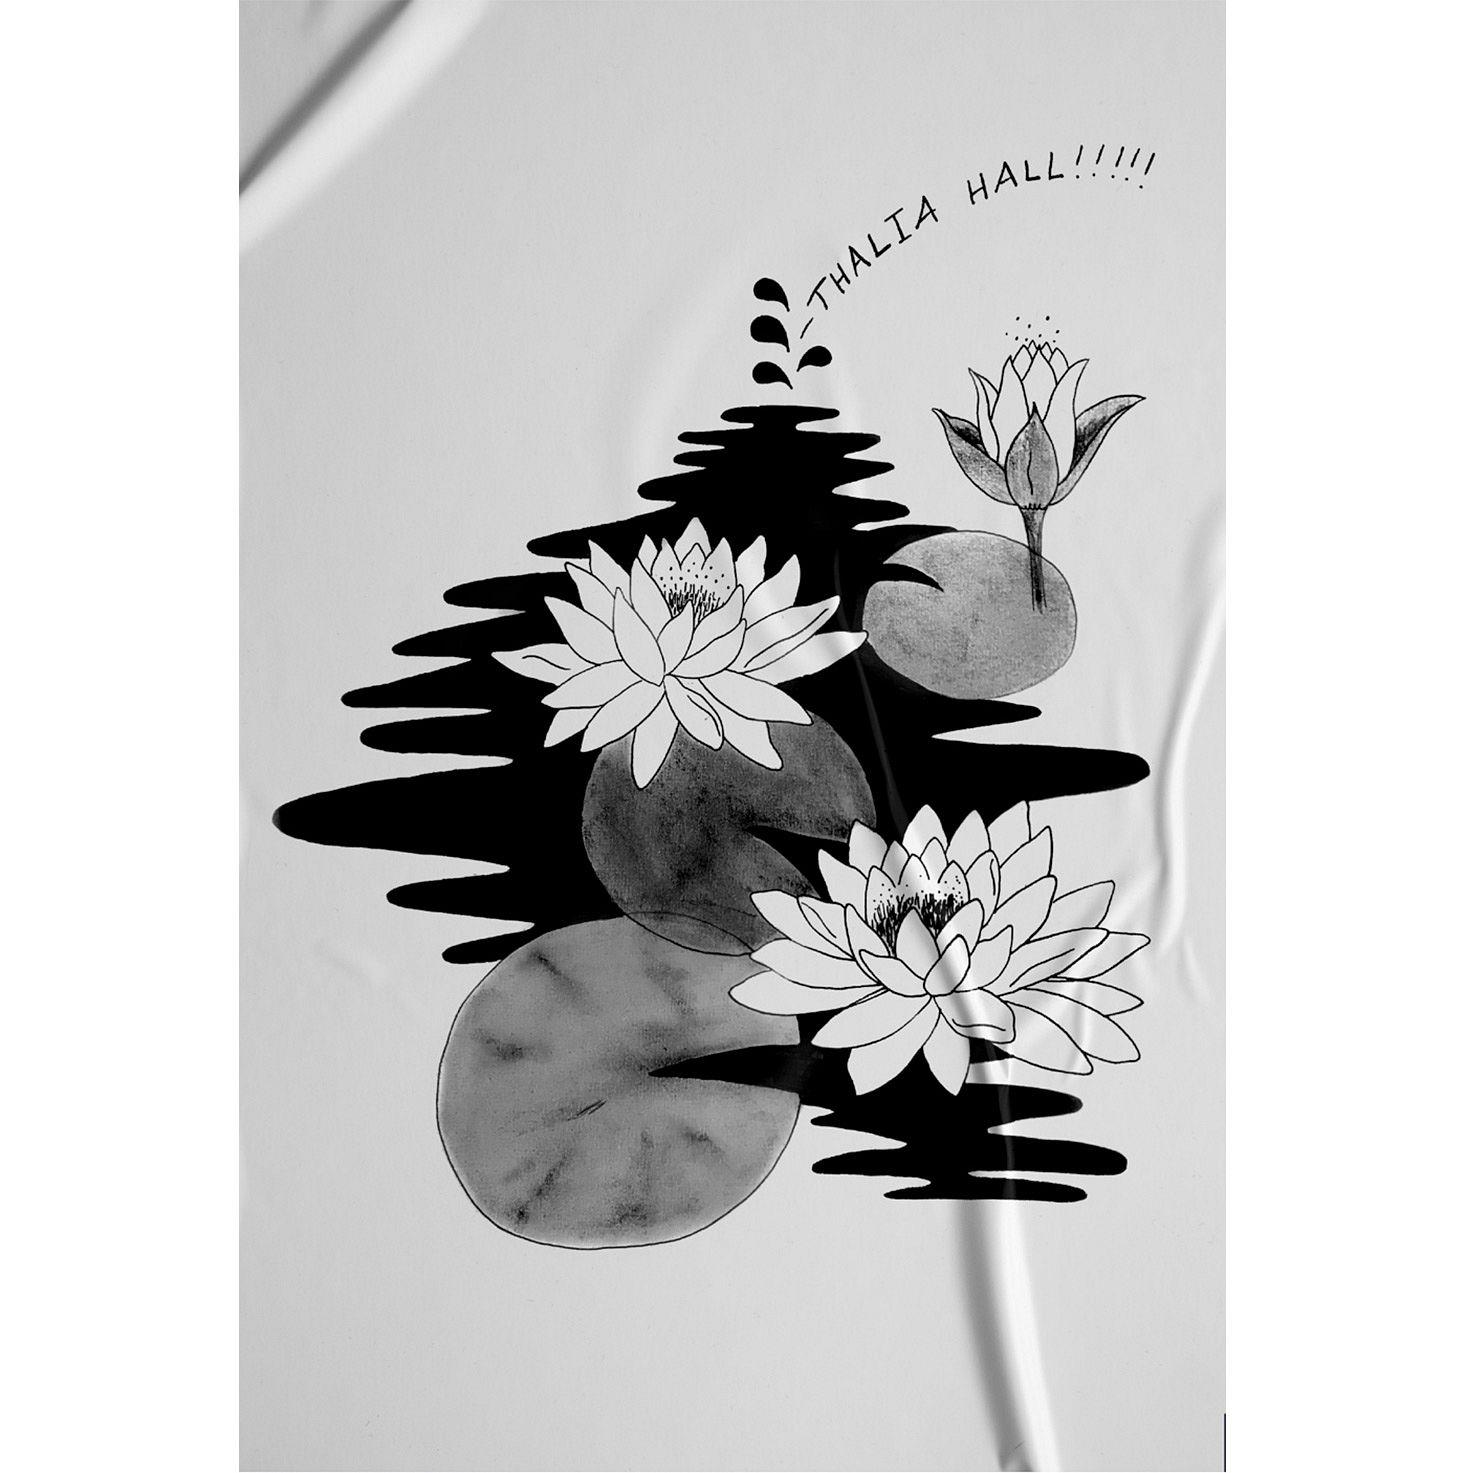 Thalia Hall Print